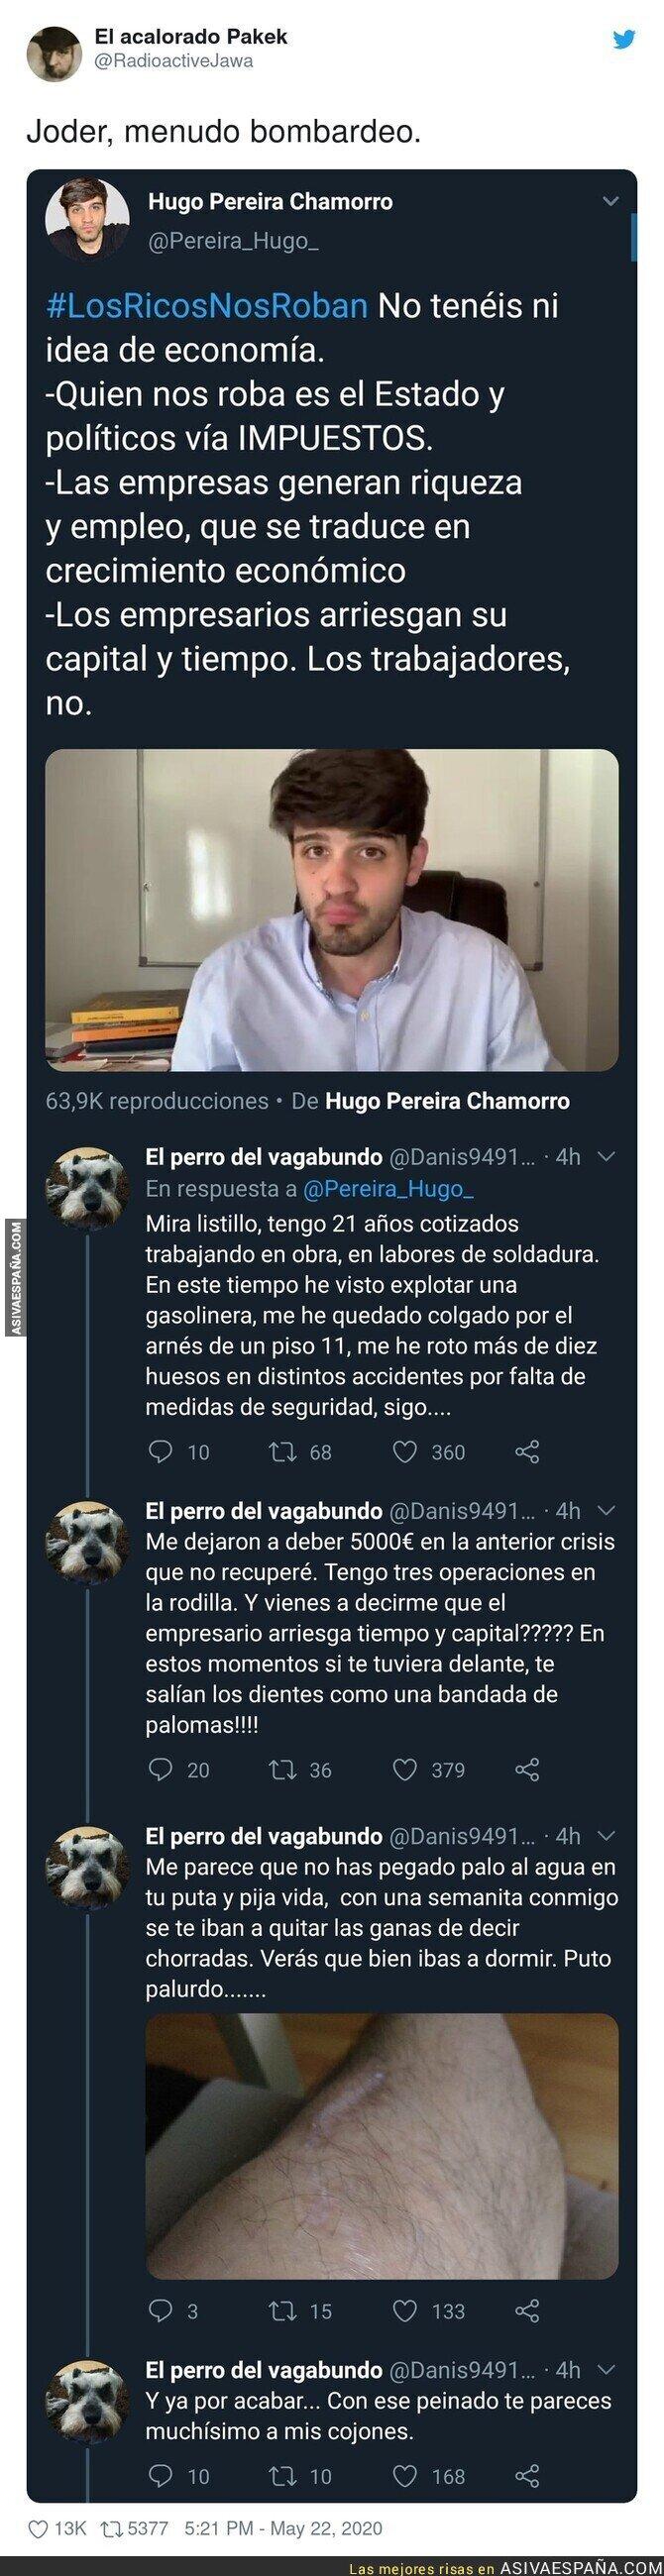 175048 - Menudo repaso le dan a Hugo Pereira después de este tuit tan lamentable